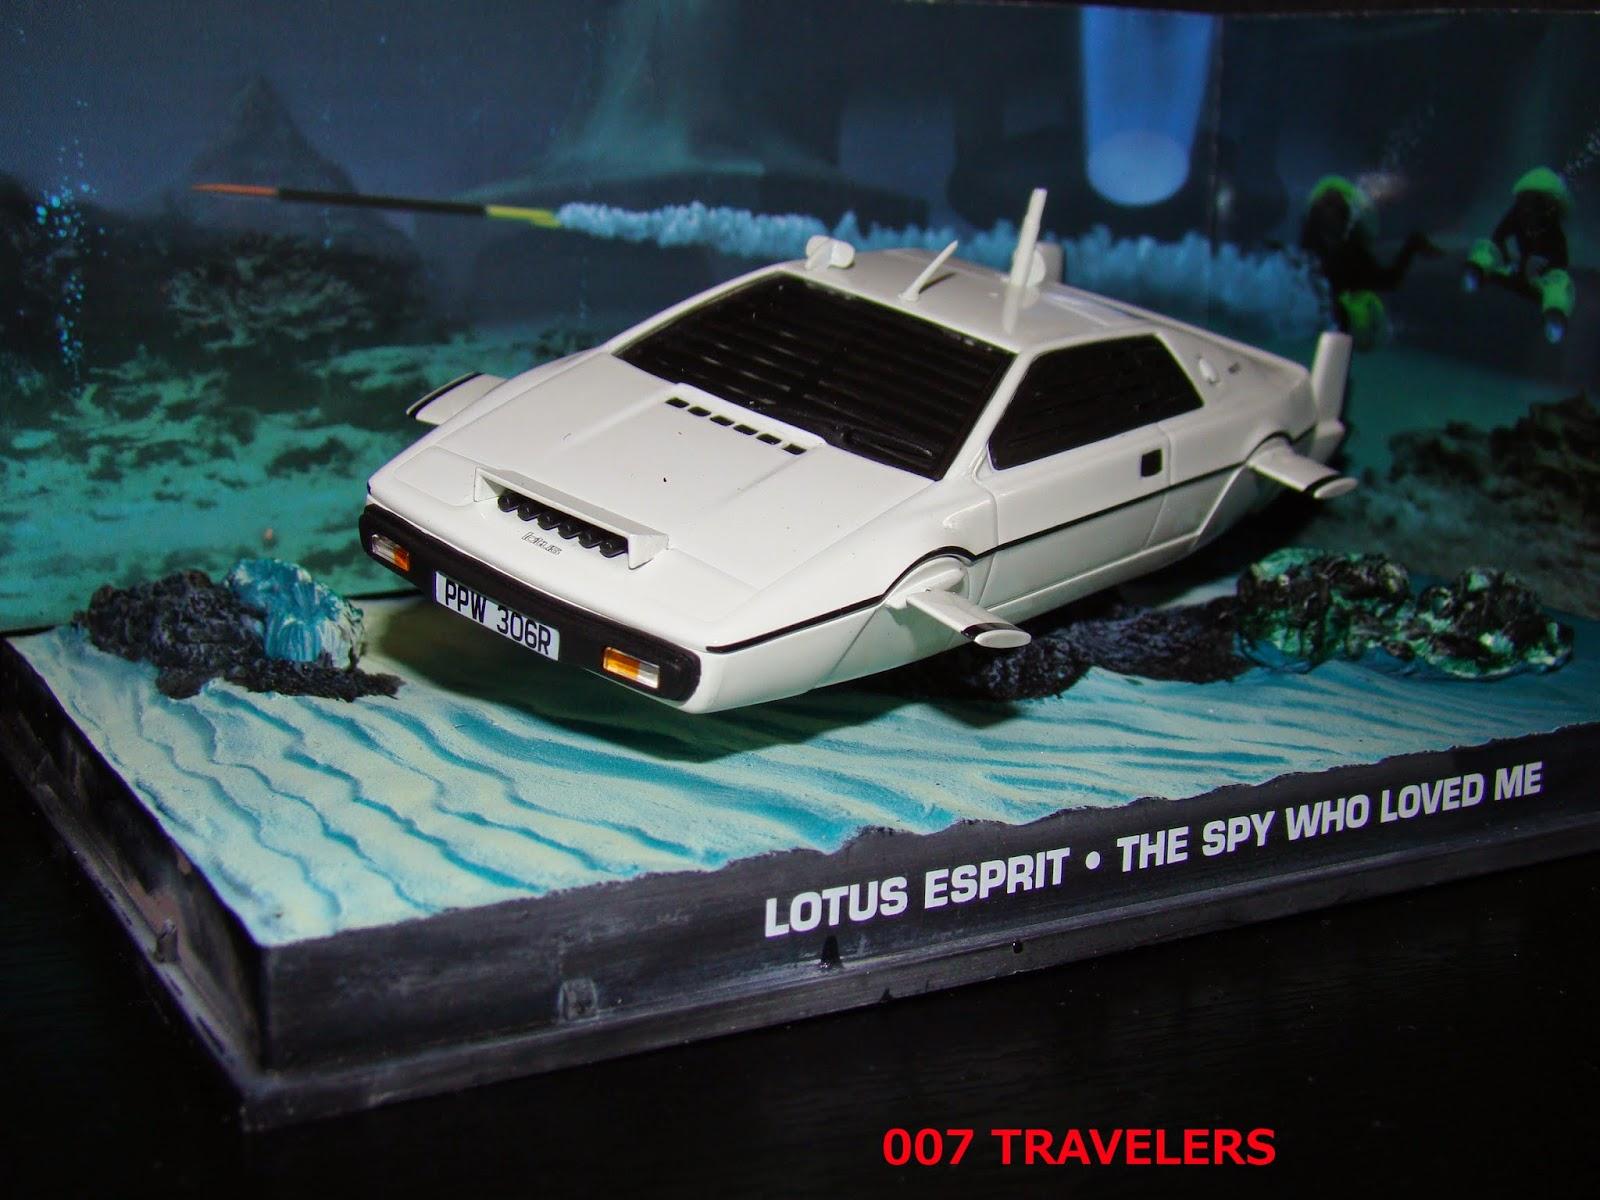 007 TRAVELERS: 007 Vehicle: Lotus Esprit / The Spy Who d Me (1977)